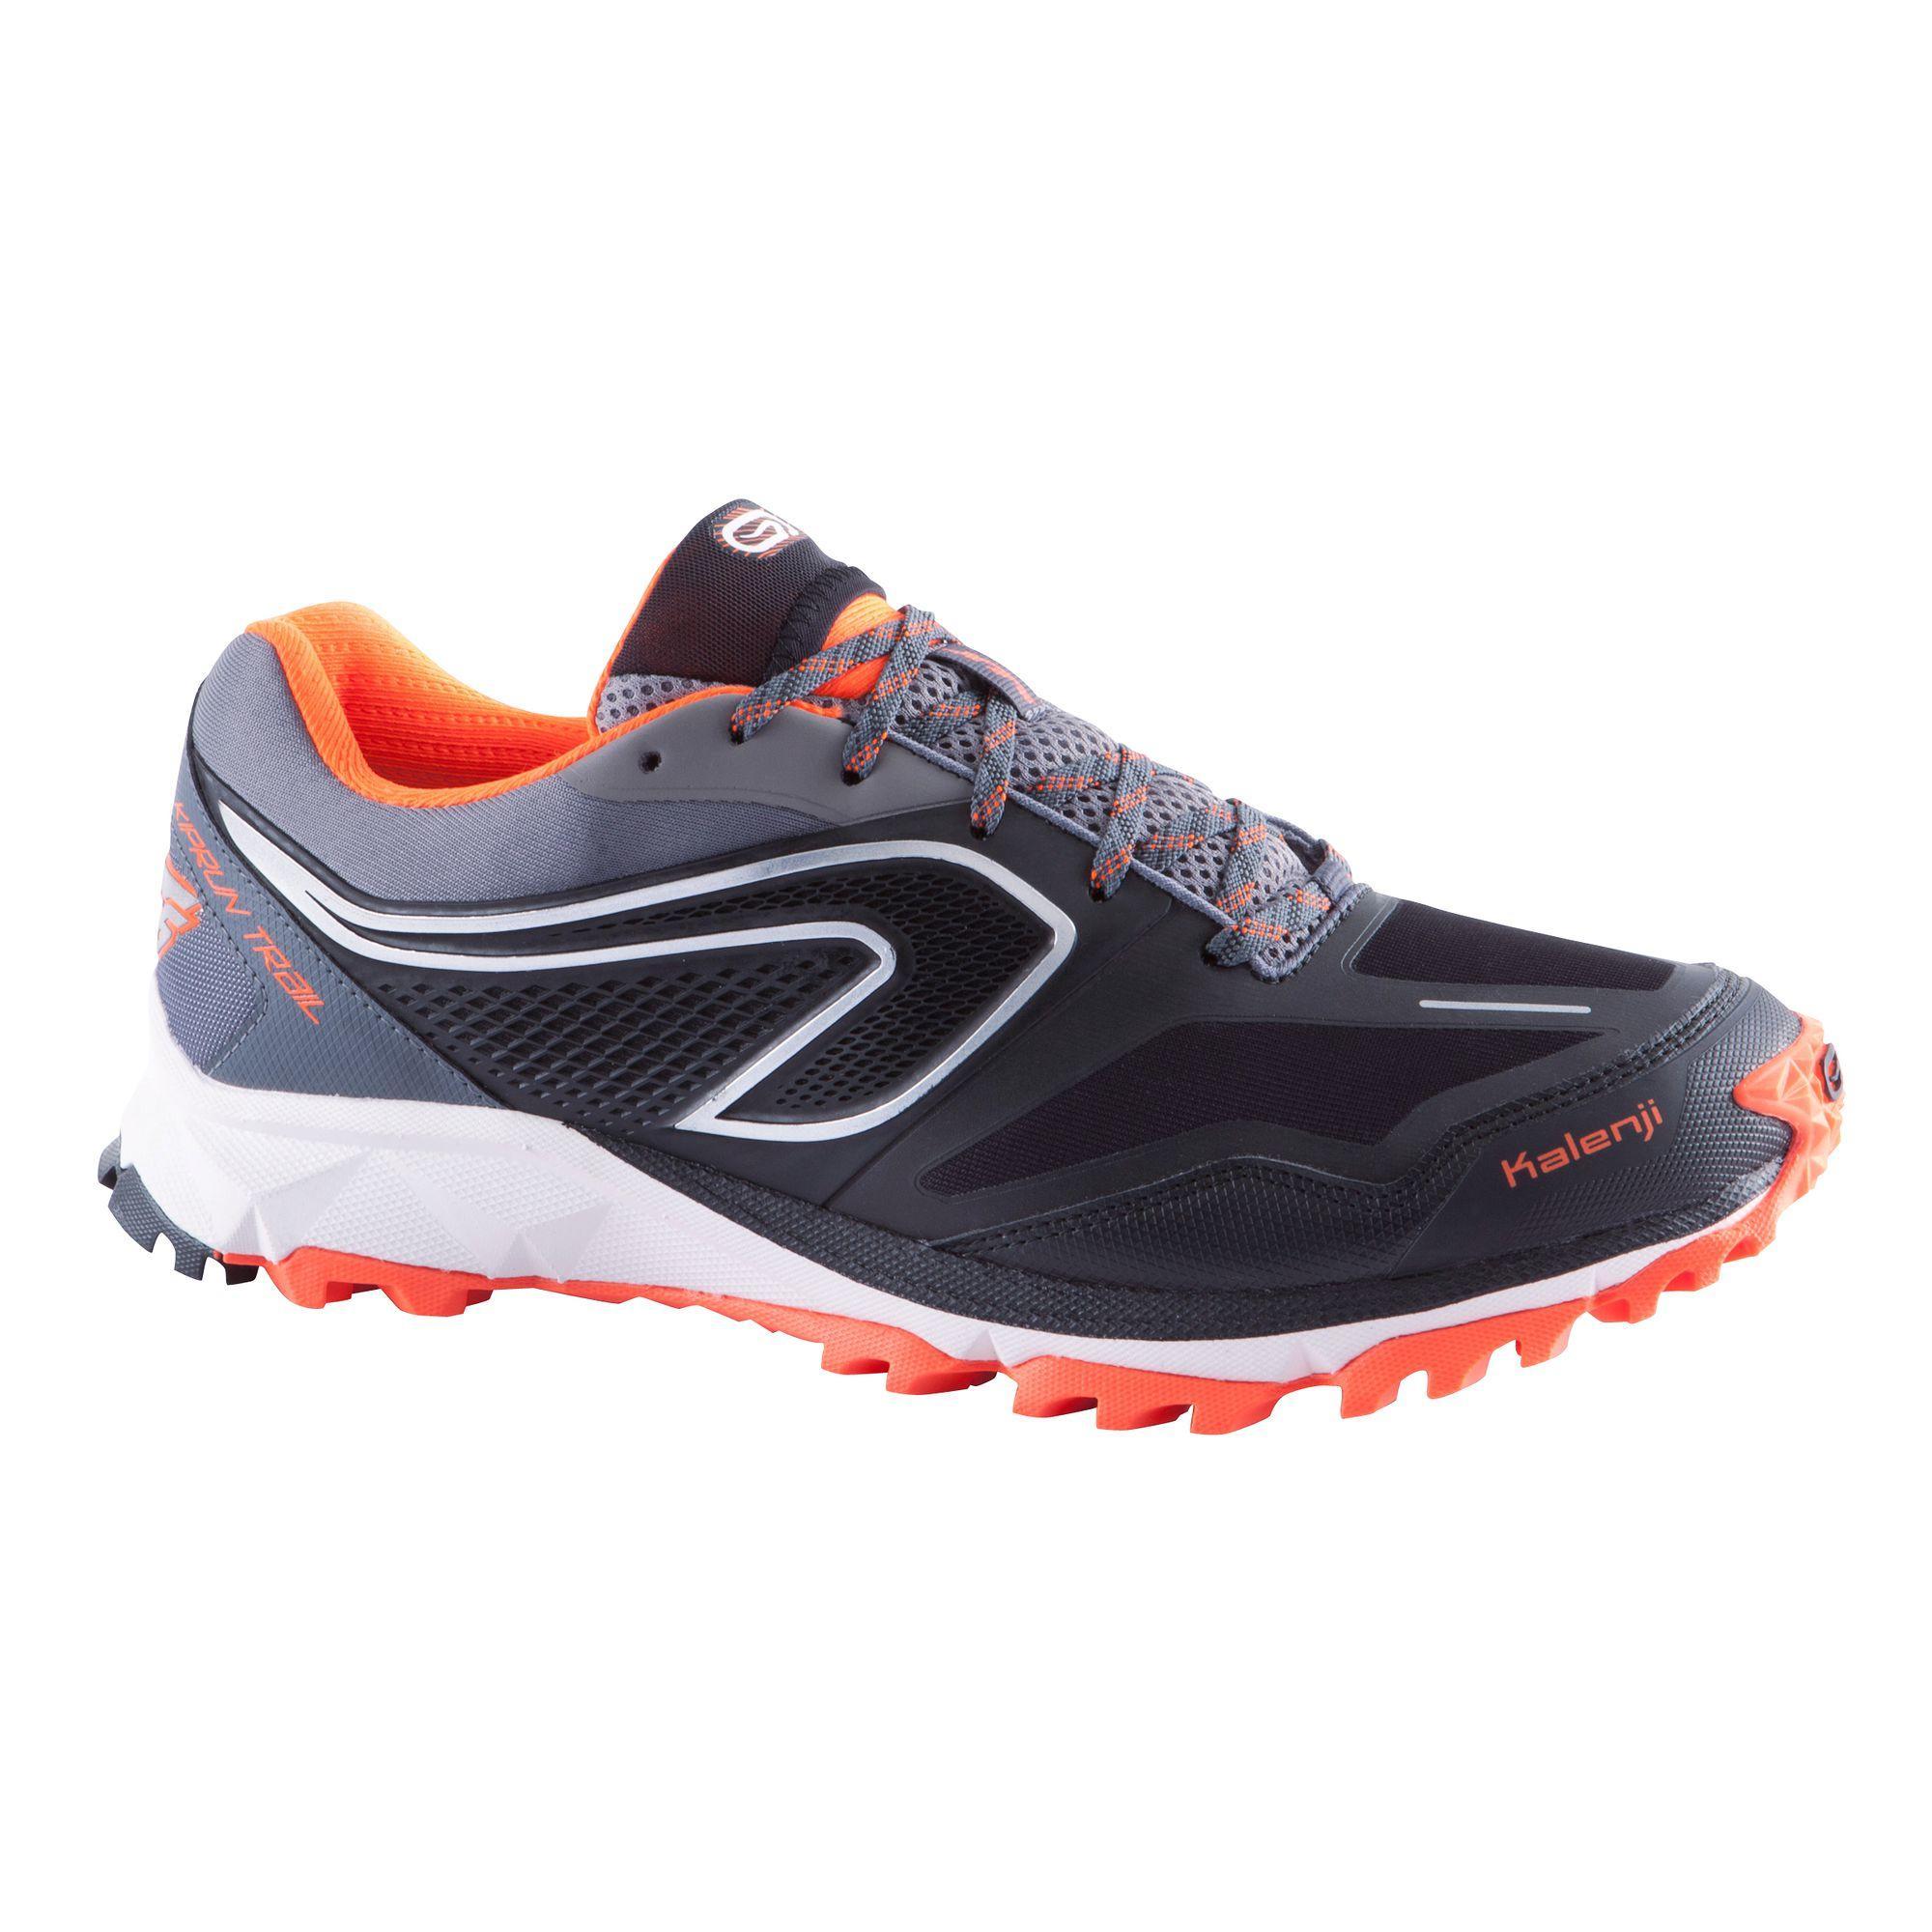 Homme Waterproof Kiprun Xt 6 Orange Chaussures Trail Noir Running oxBthQdsrC